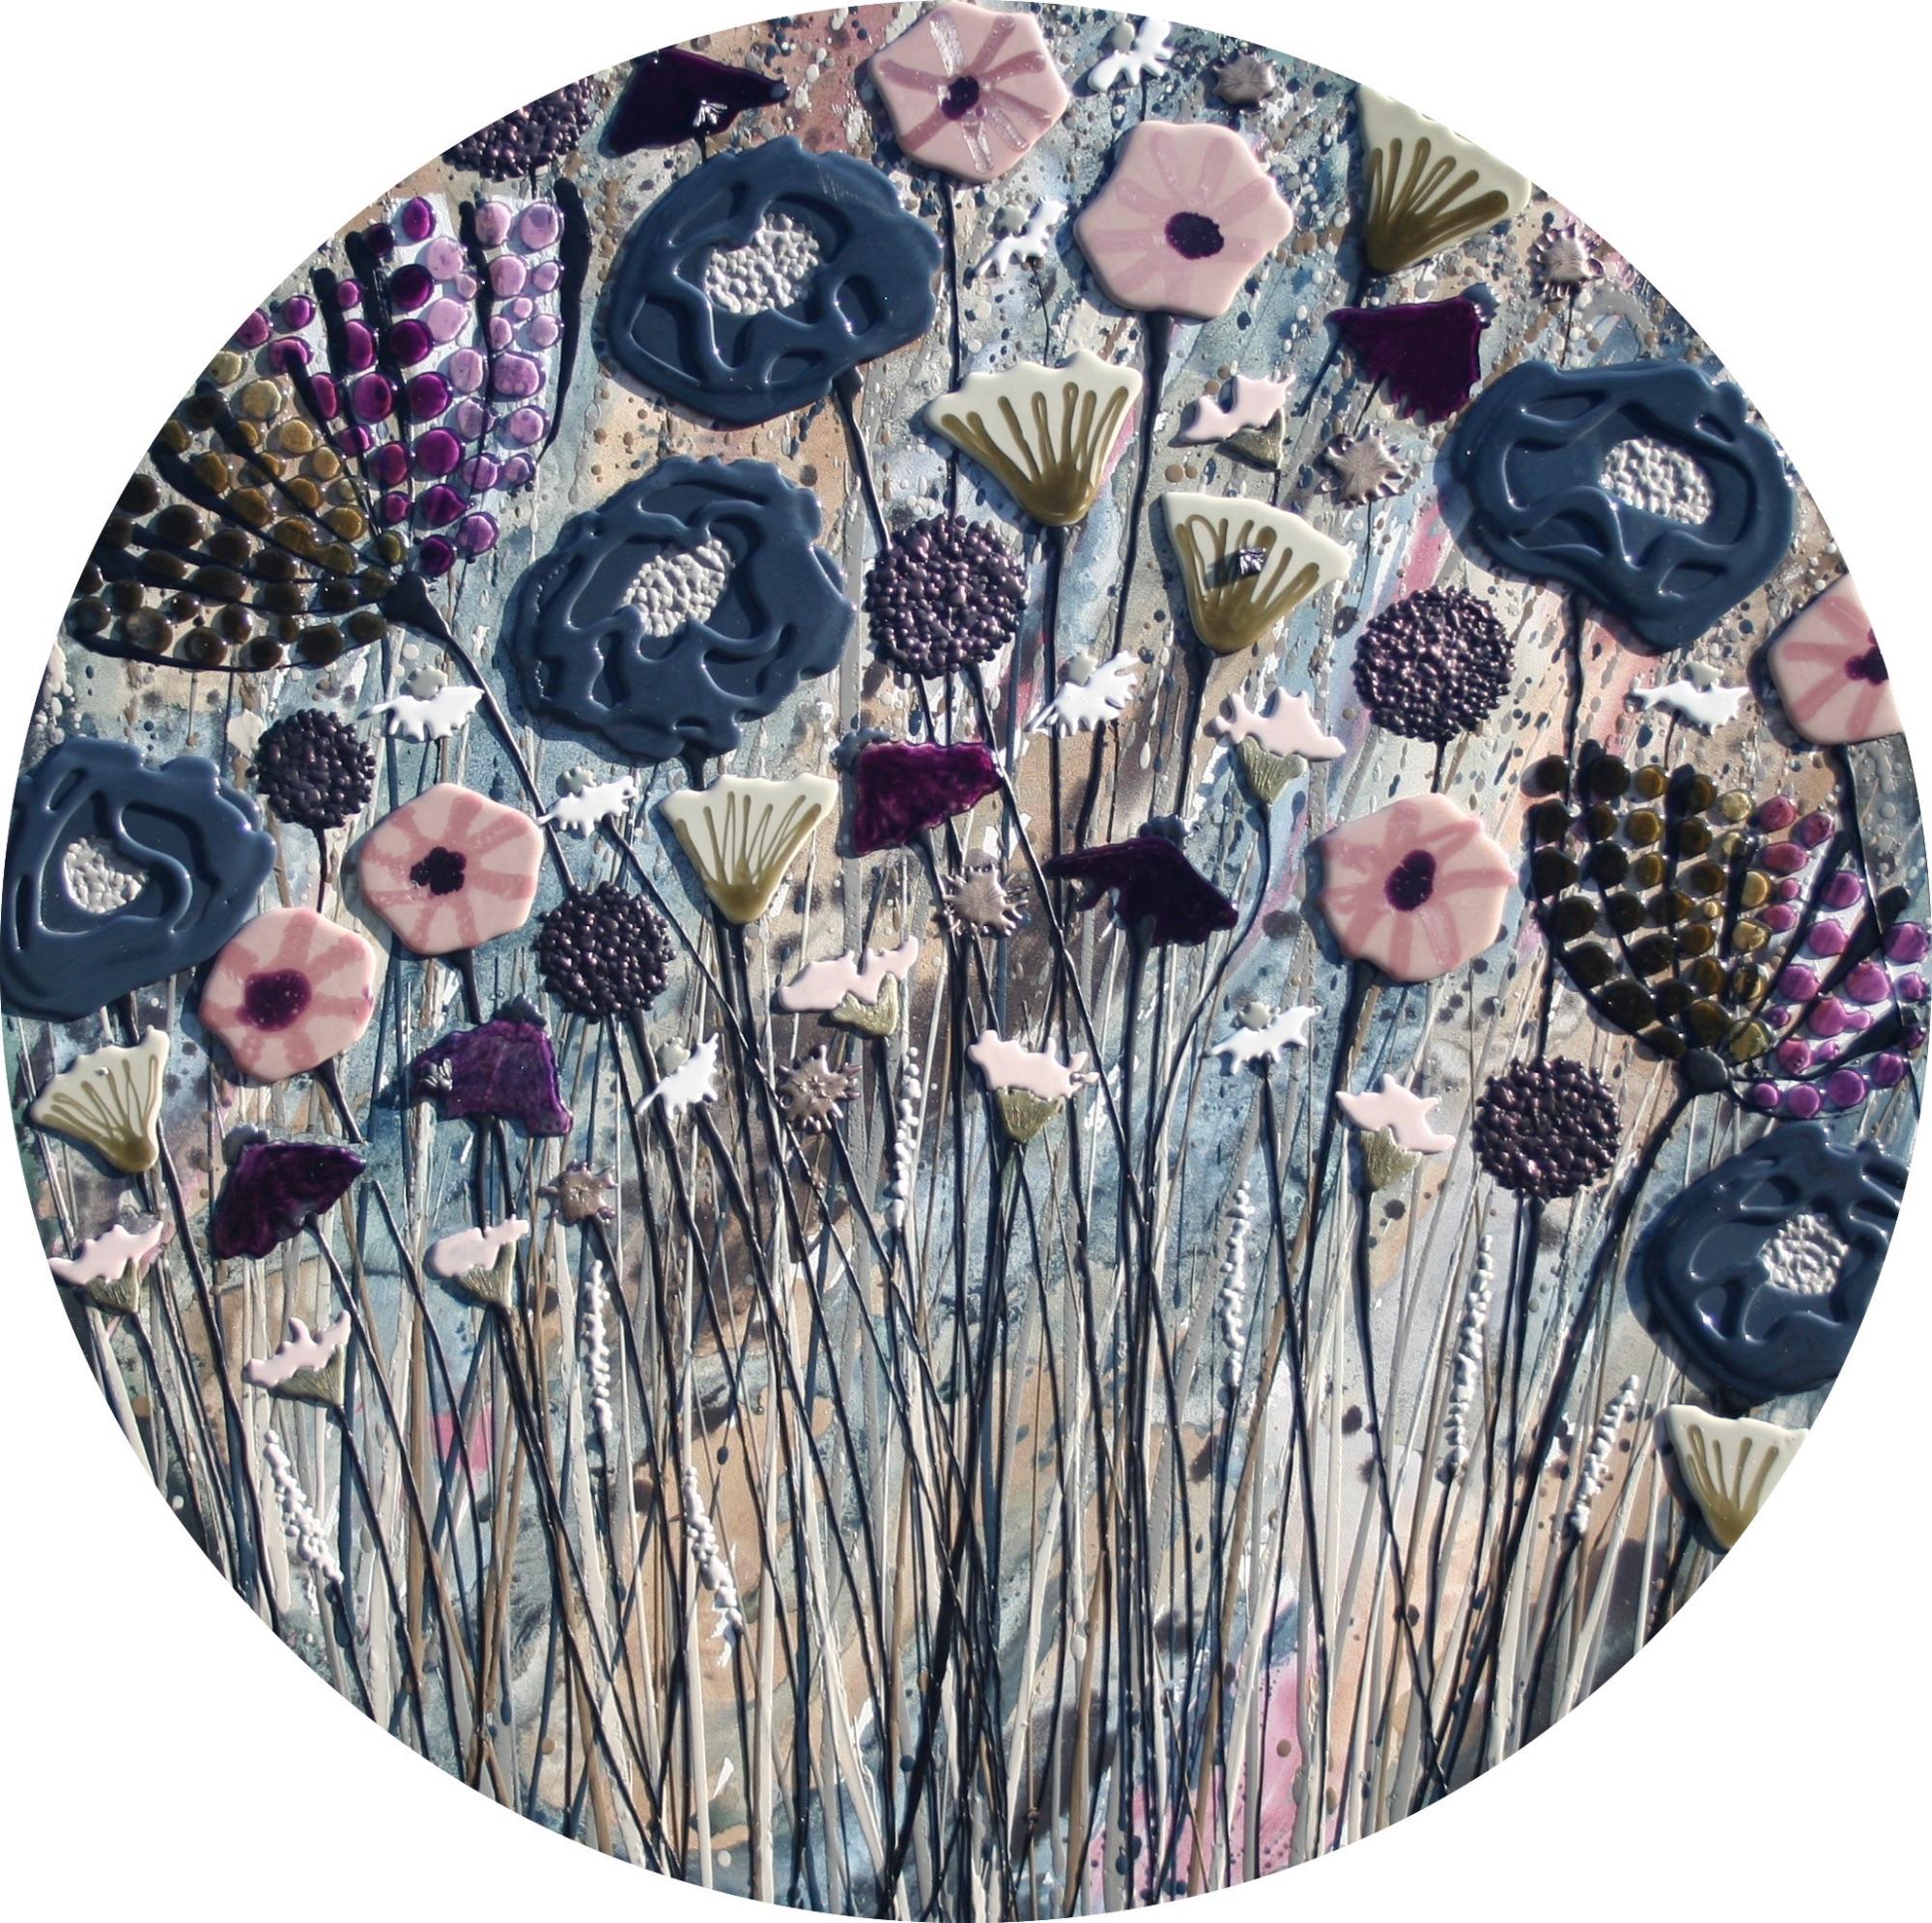 Circular Dark Blue Meadow - 100cm Diameter - Beeswax & Glass on Board